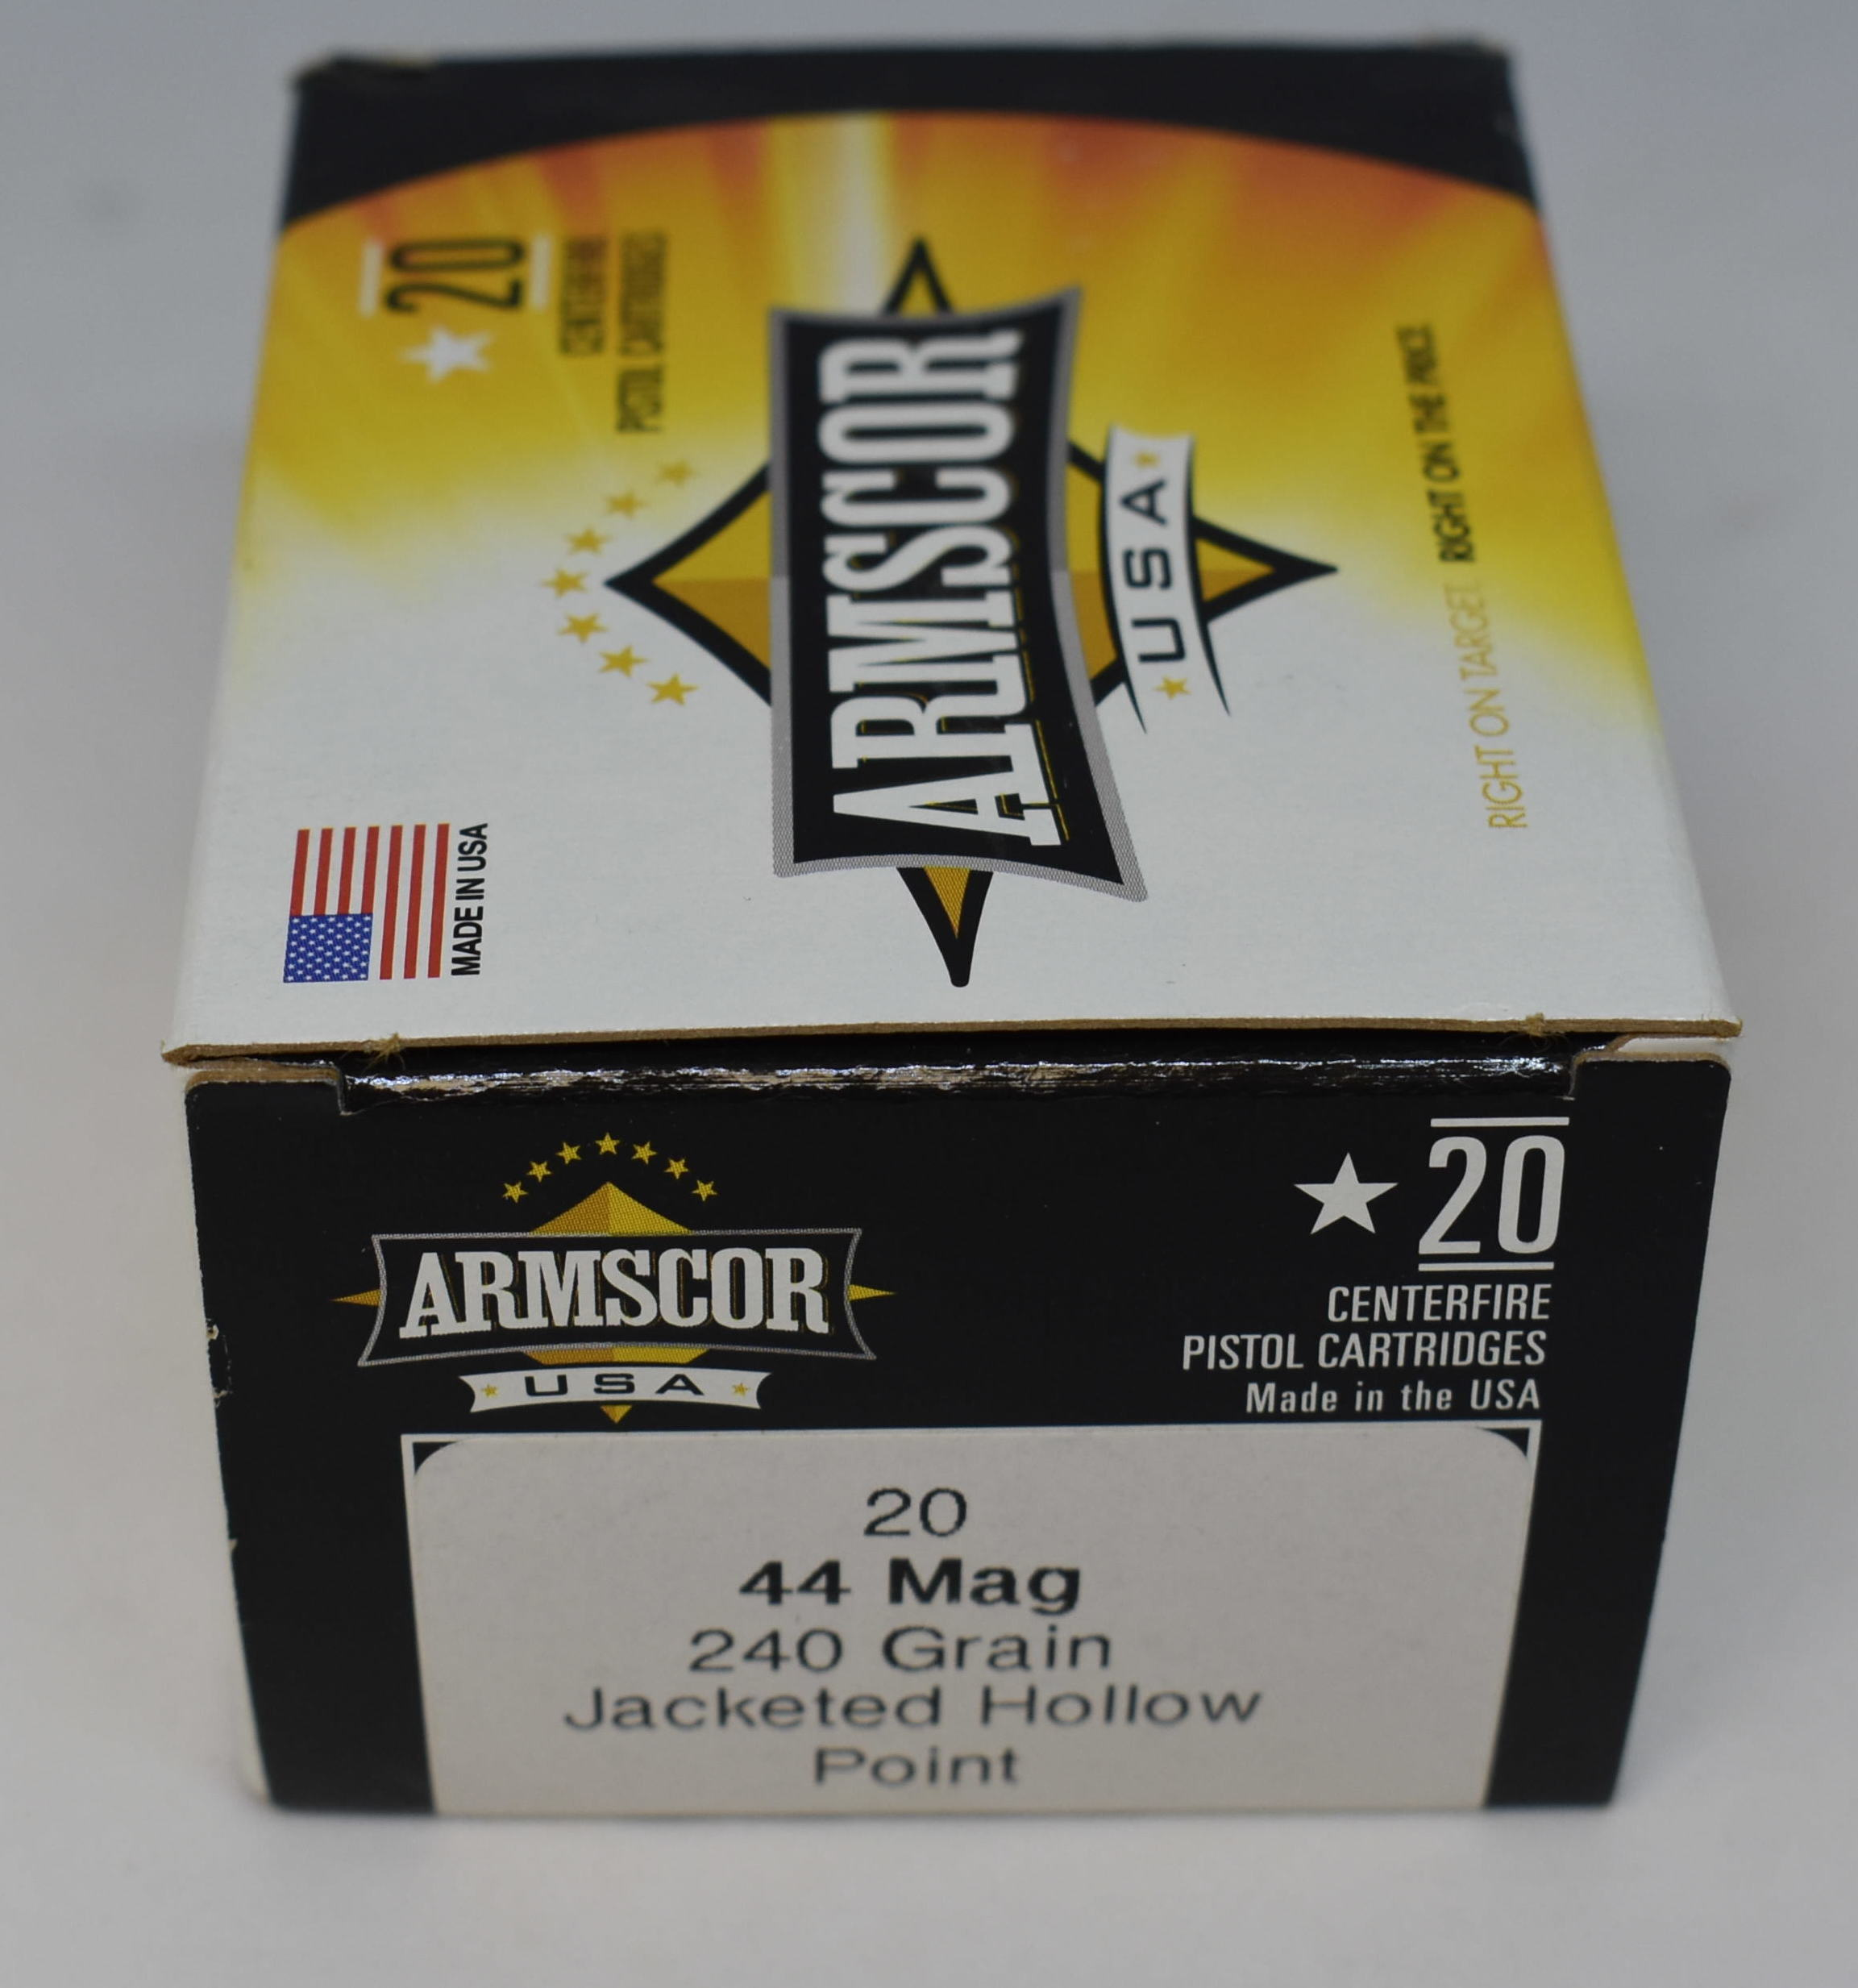 ARMSCOR - 44mag - AMMUNITION SPORTING EQUIPMENT